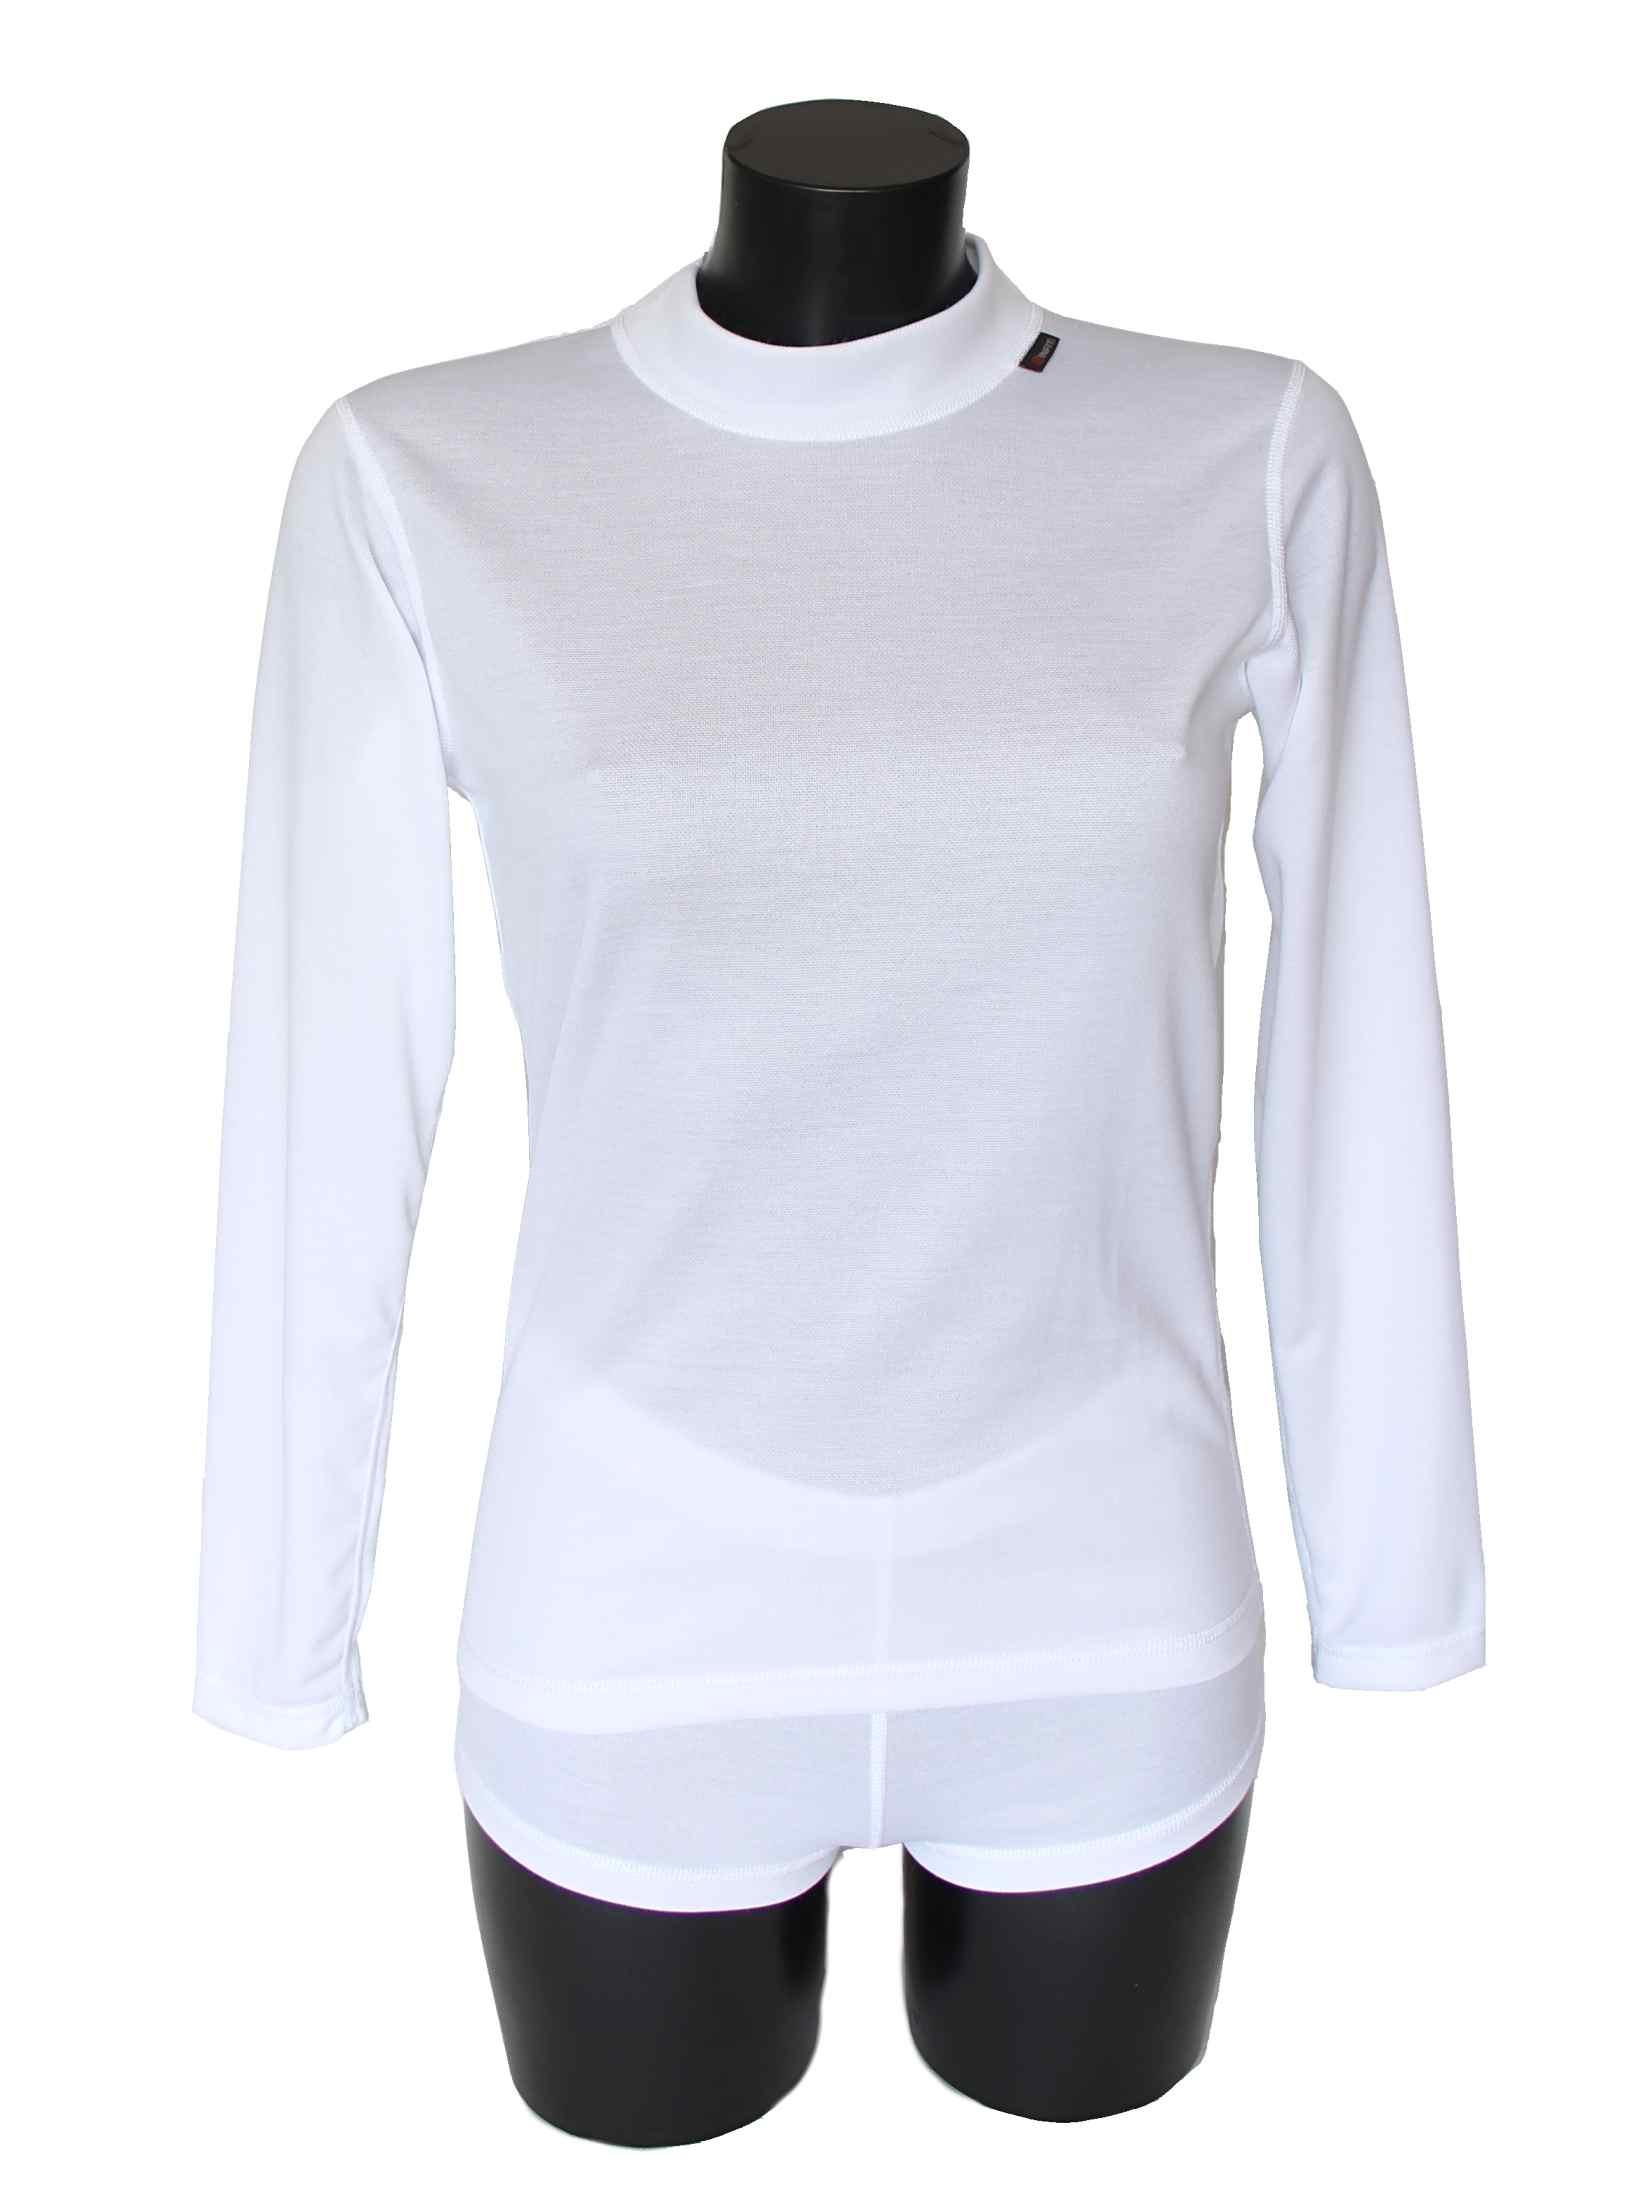 Loft dámské triko s dlouhým rukávem LIMITOVANÁ SÉRIE ! 21fd401892